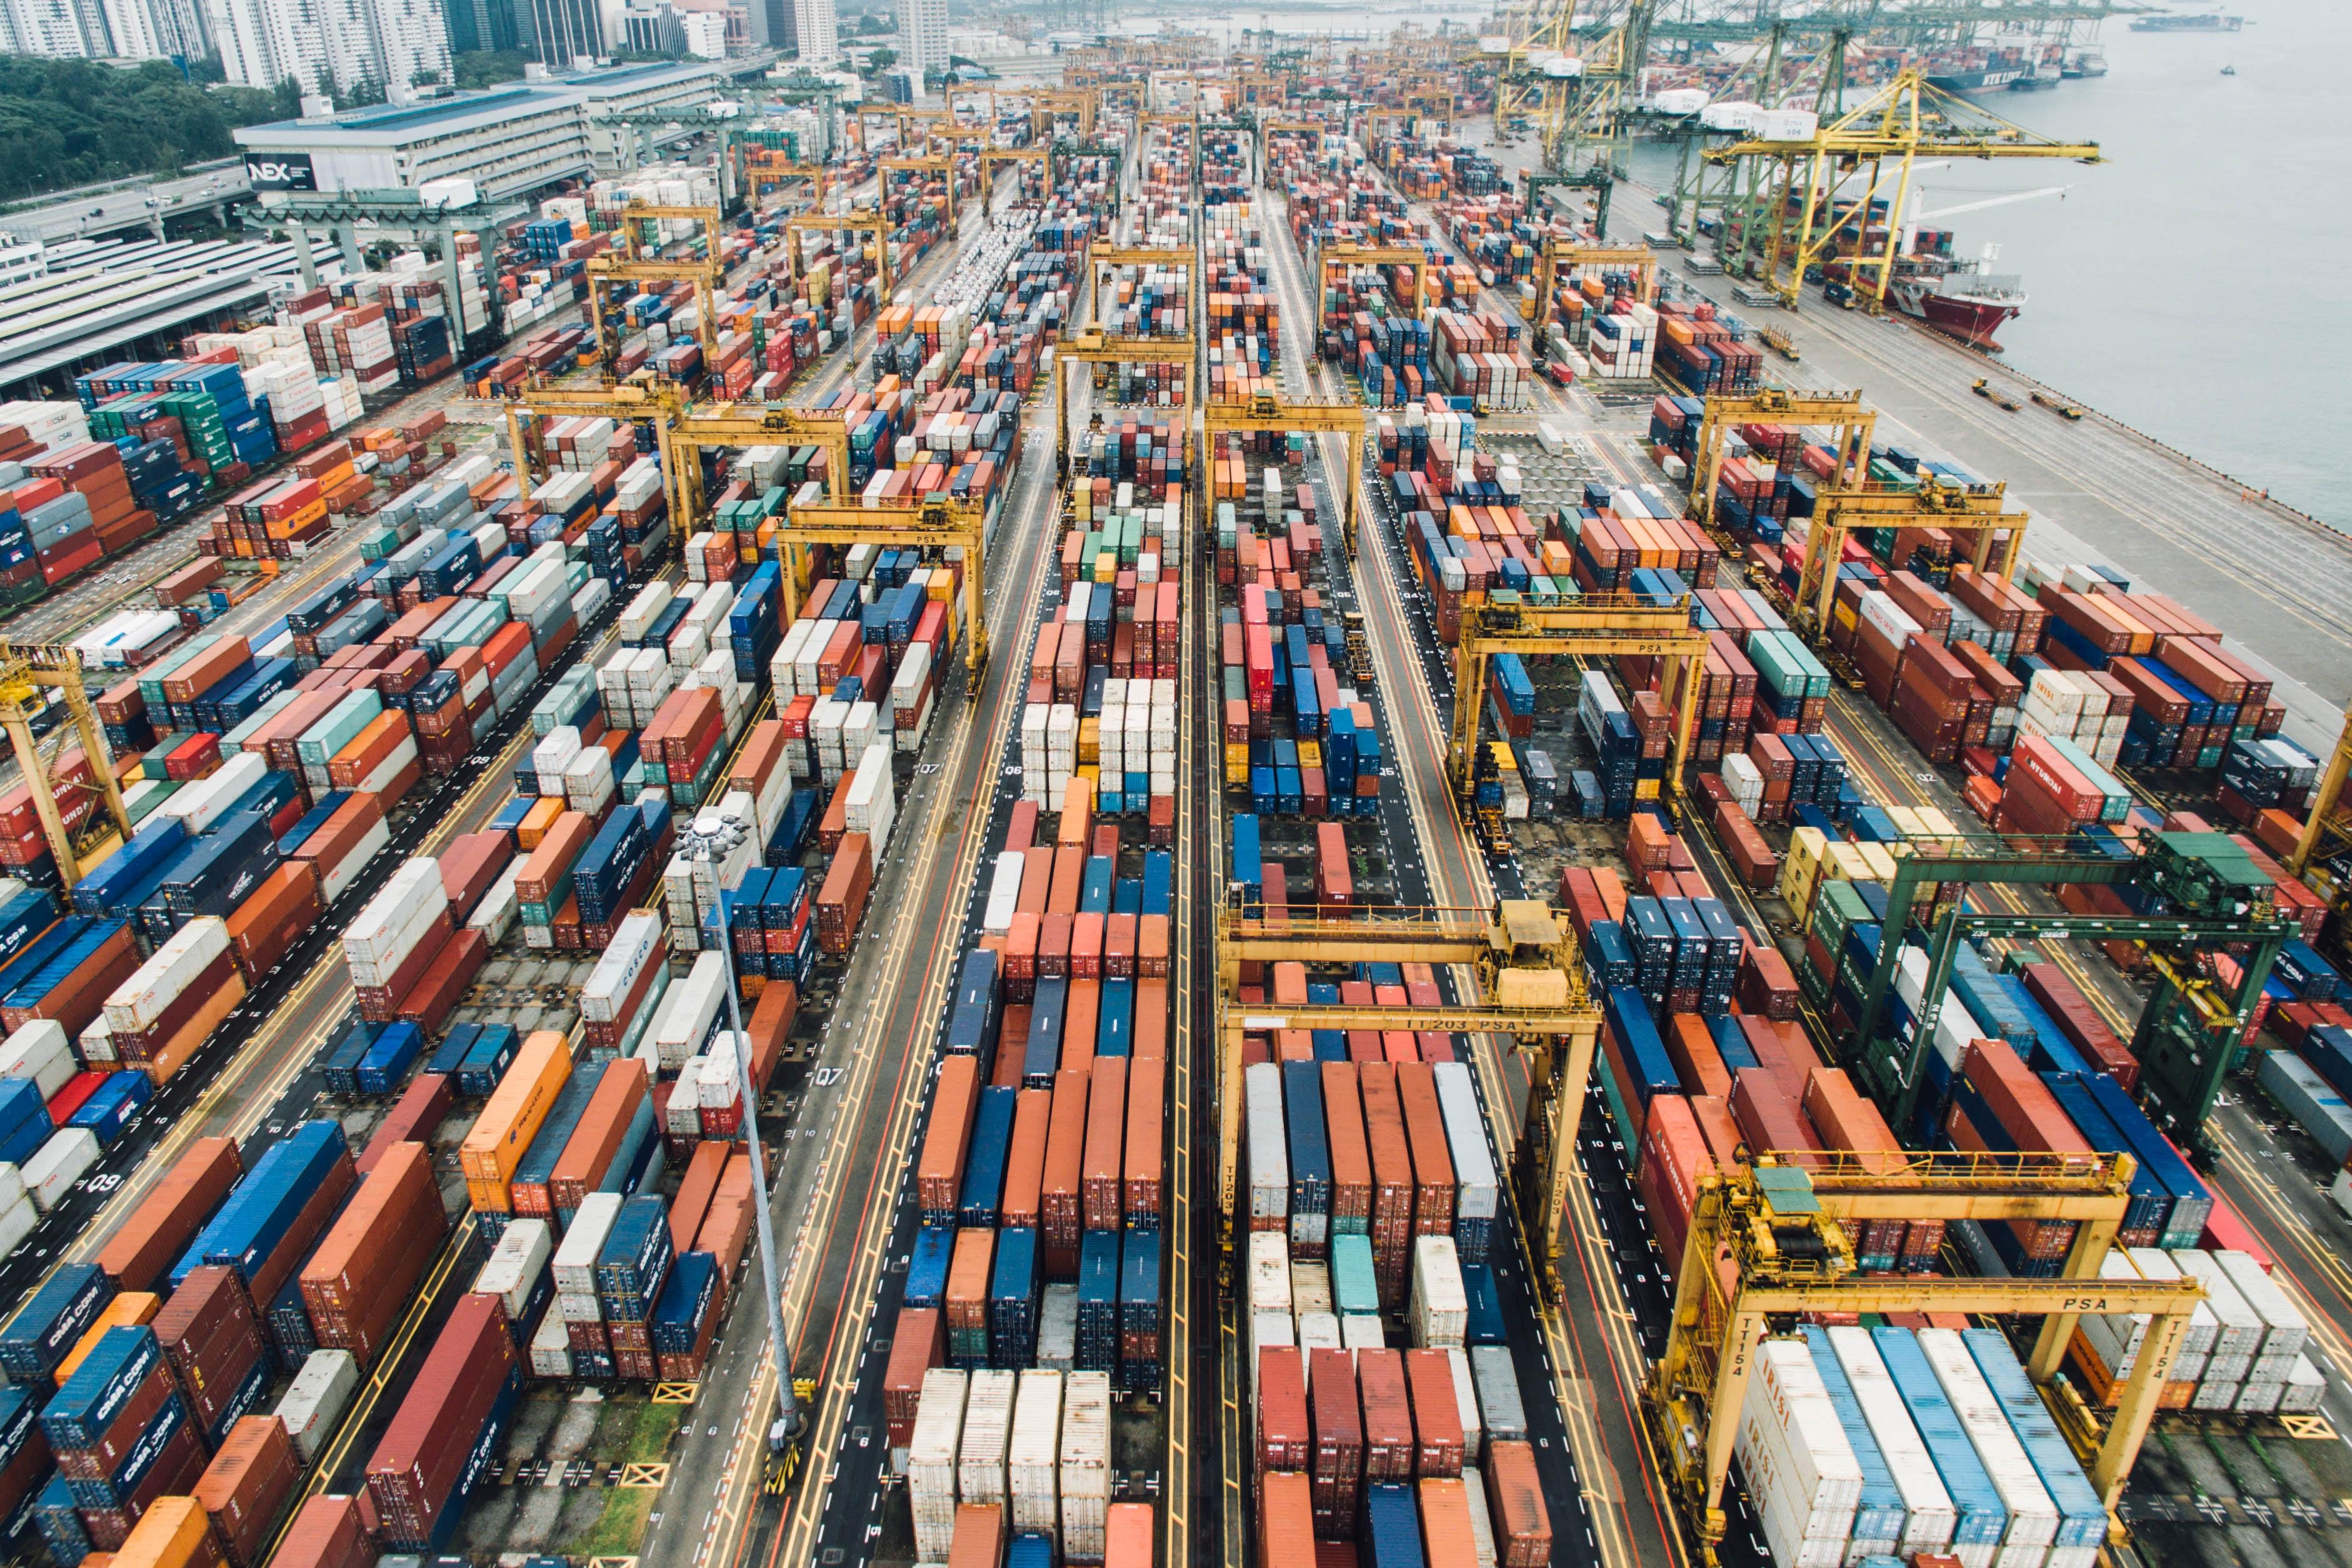 Zahl der ukrainischen Exporte um 20% gestiegen in 2017